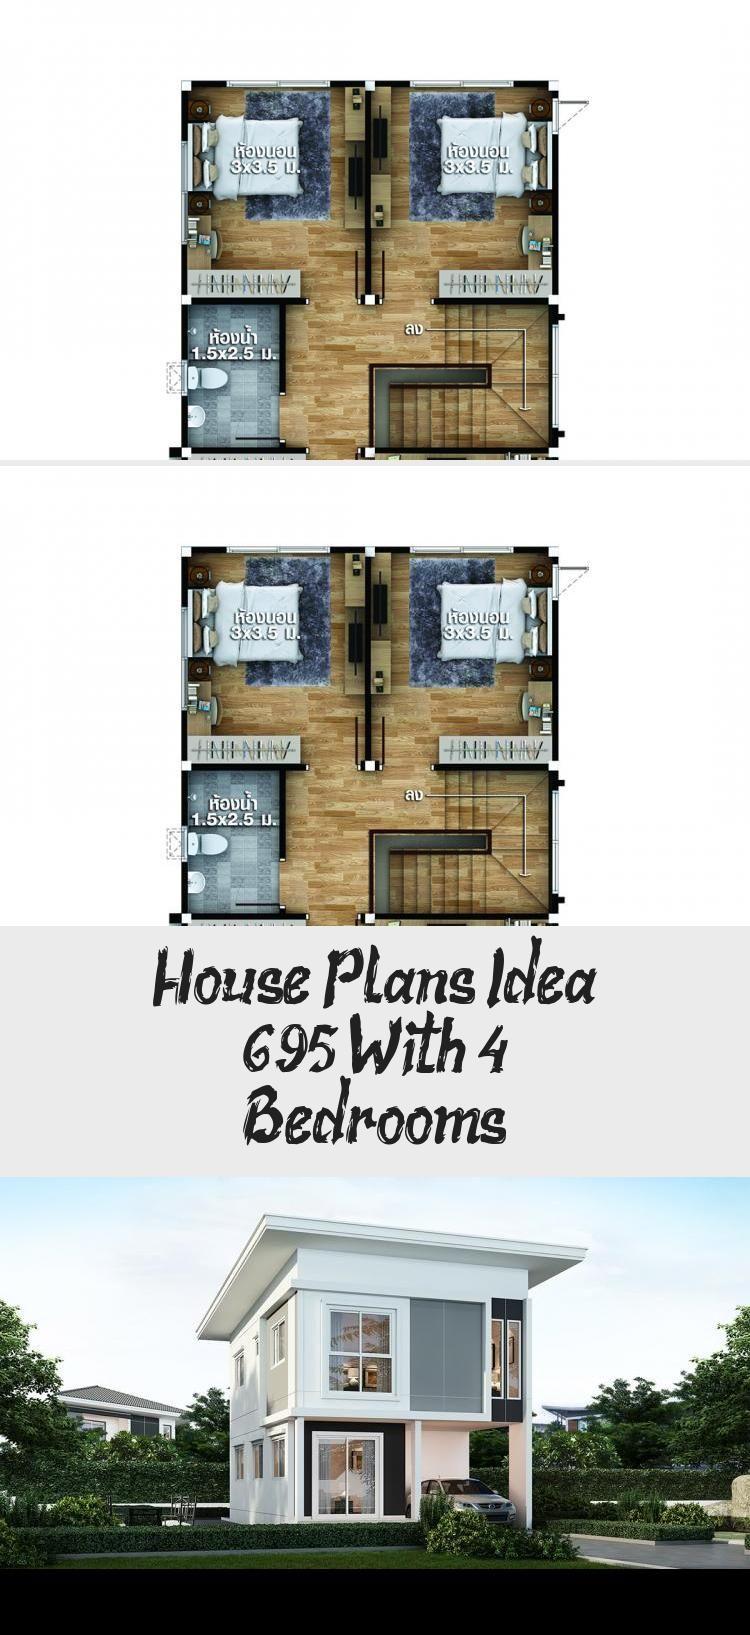 House Plans Idea 6x9 5 With 4 Bedrooms Sam House Plans Houseplansnewzealand Acadianhouseplans Medite In 2020 House Plans Acadian House Plans Victorian House Plans